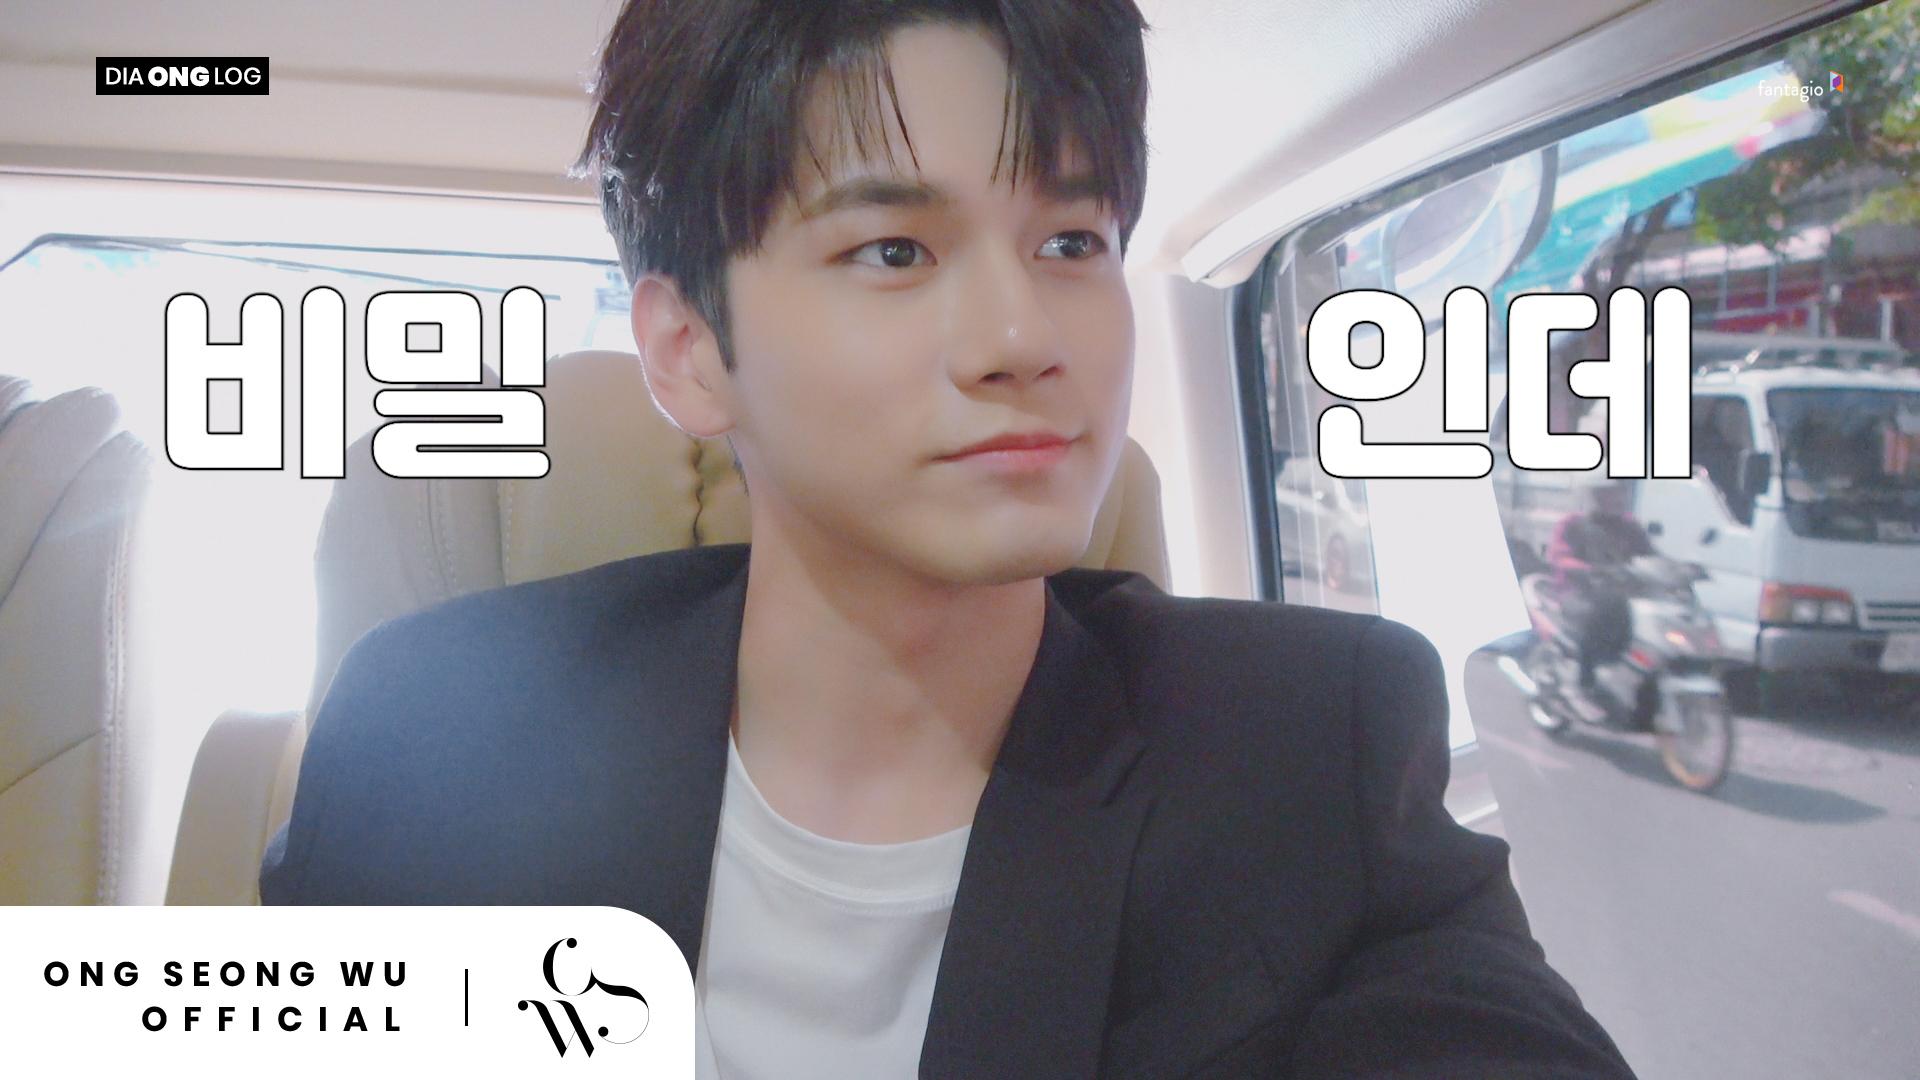 ONG SEONG WU 옹성우 - [diaONGlog] 더스프링홈 팬사인회 in 태국 비하인드